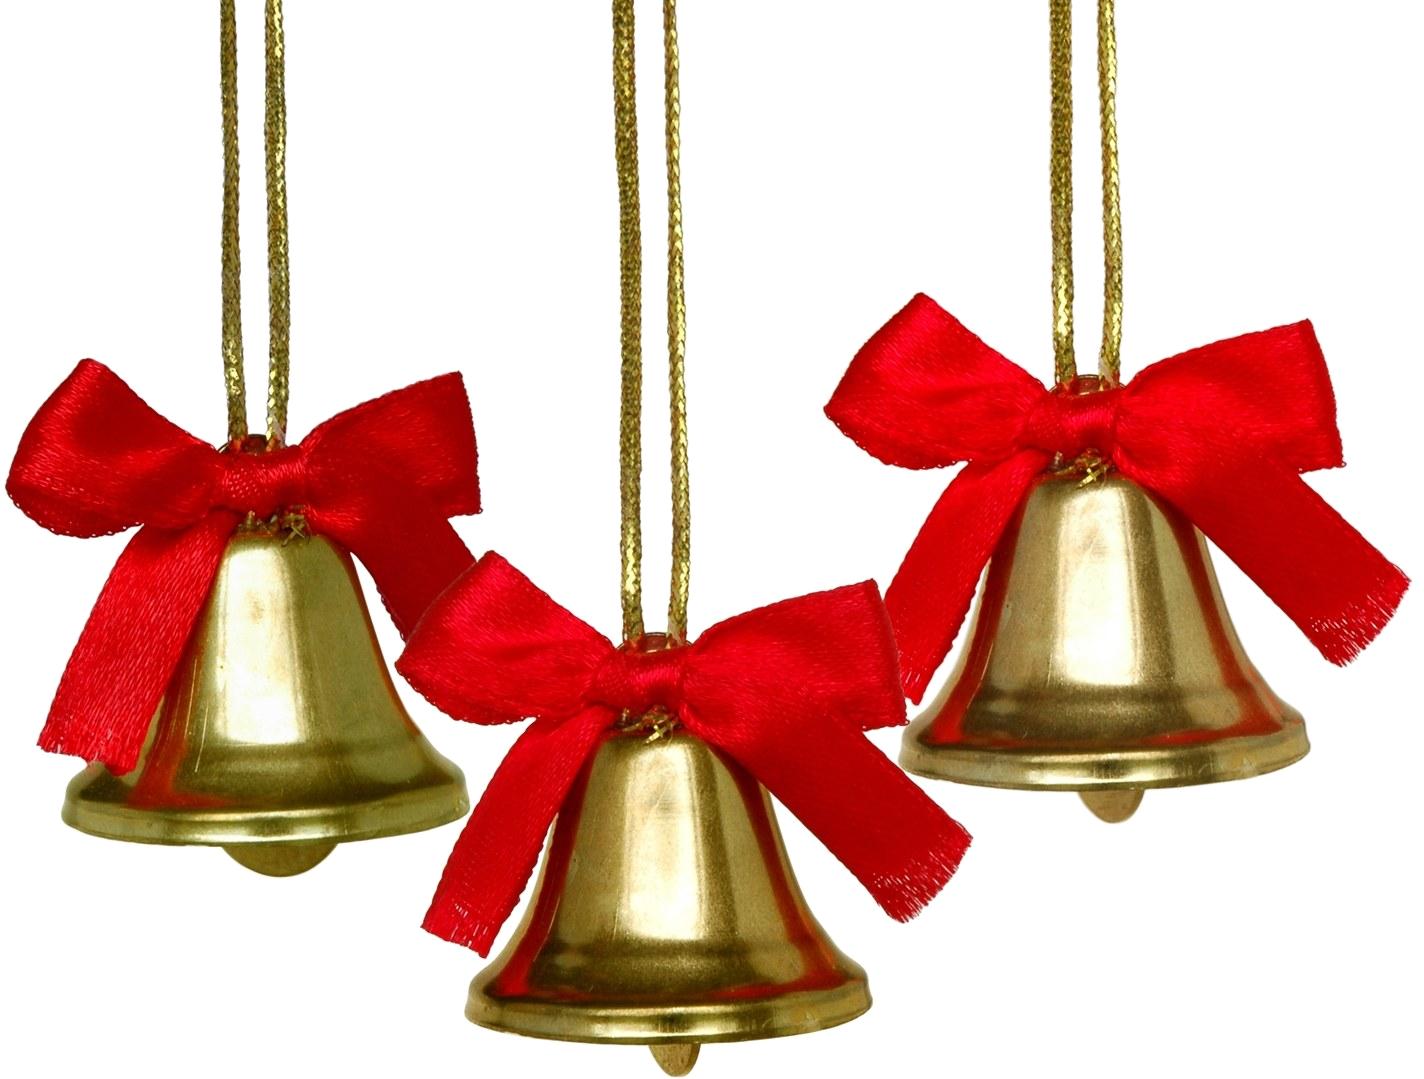 Xmas ornament bell png by iamszissz on deviantart